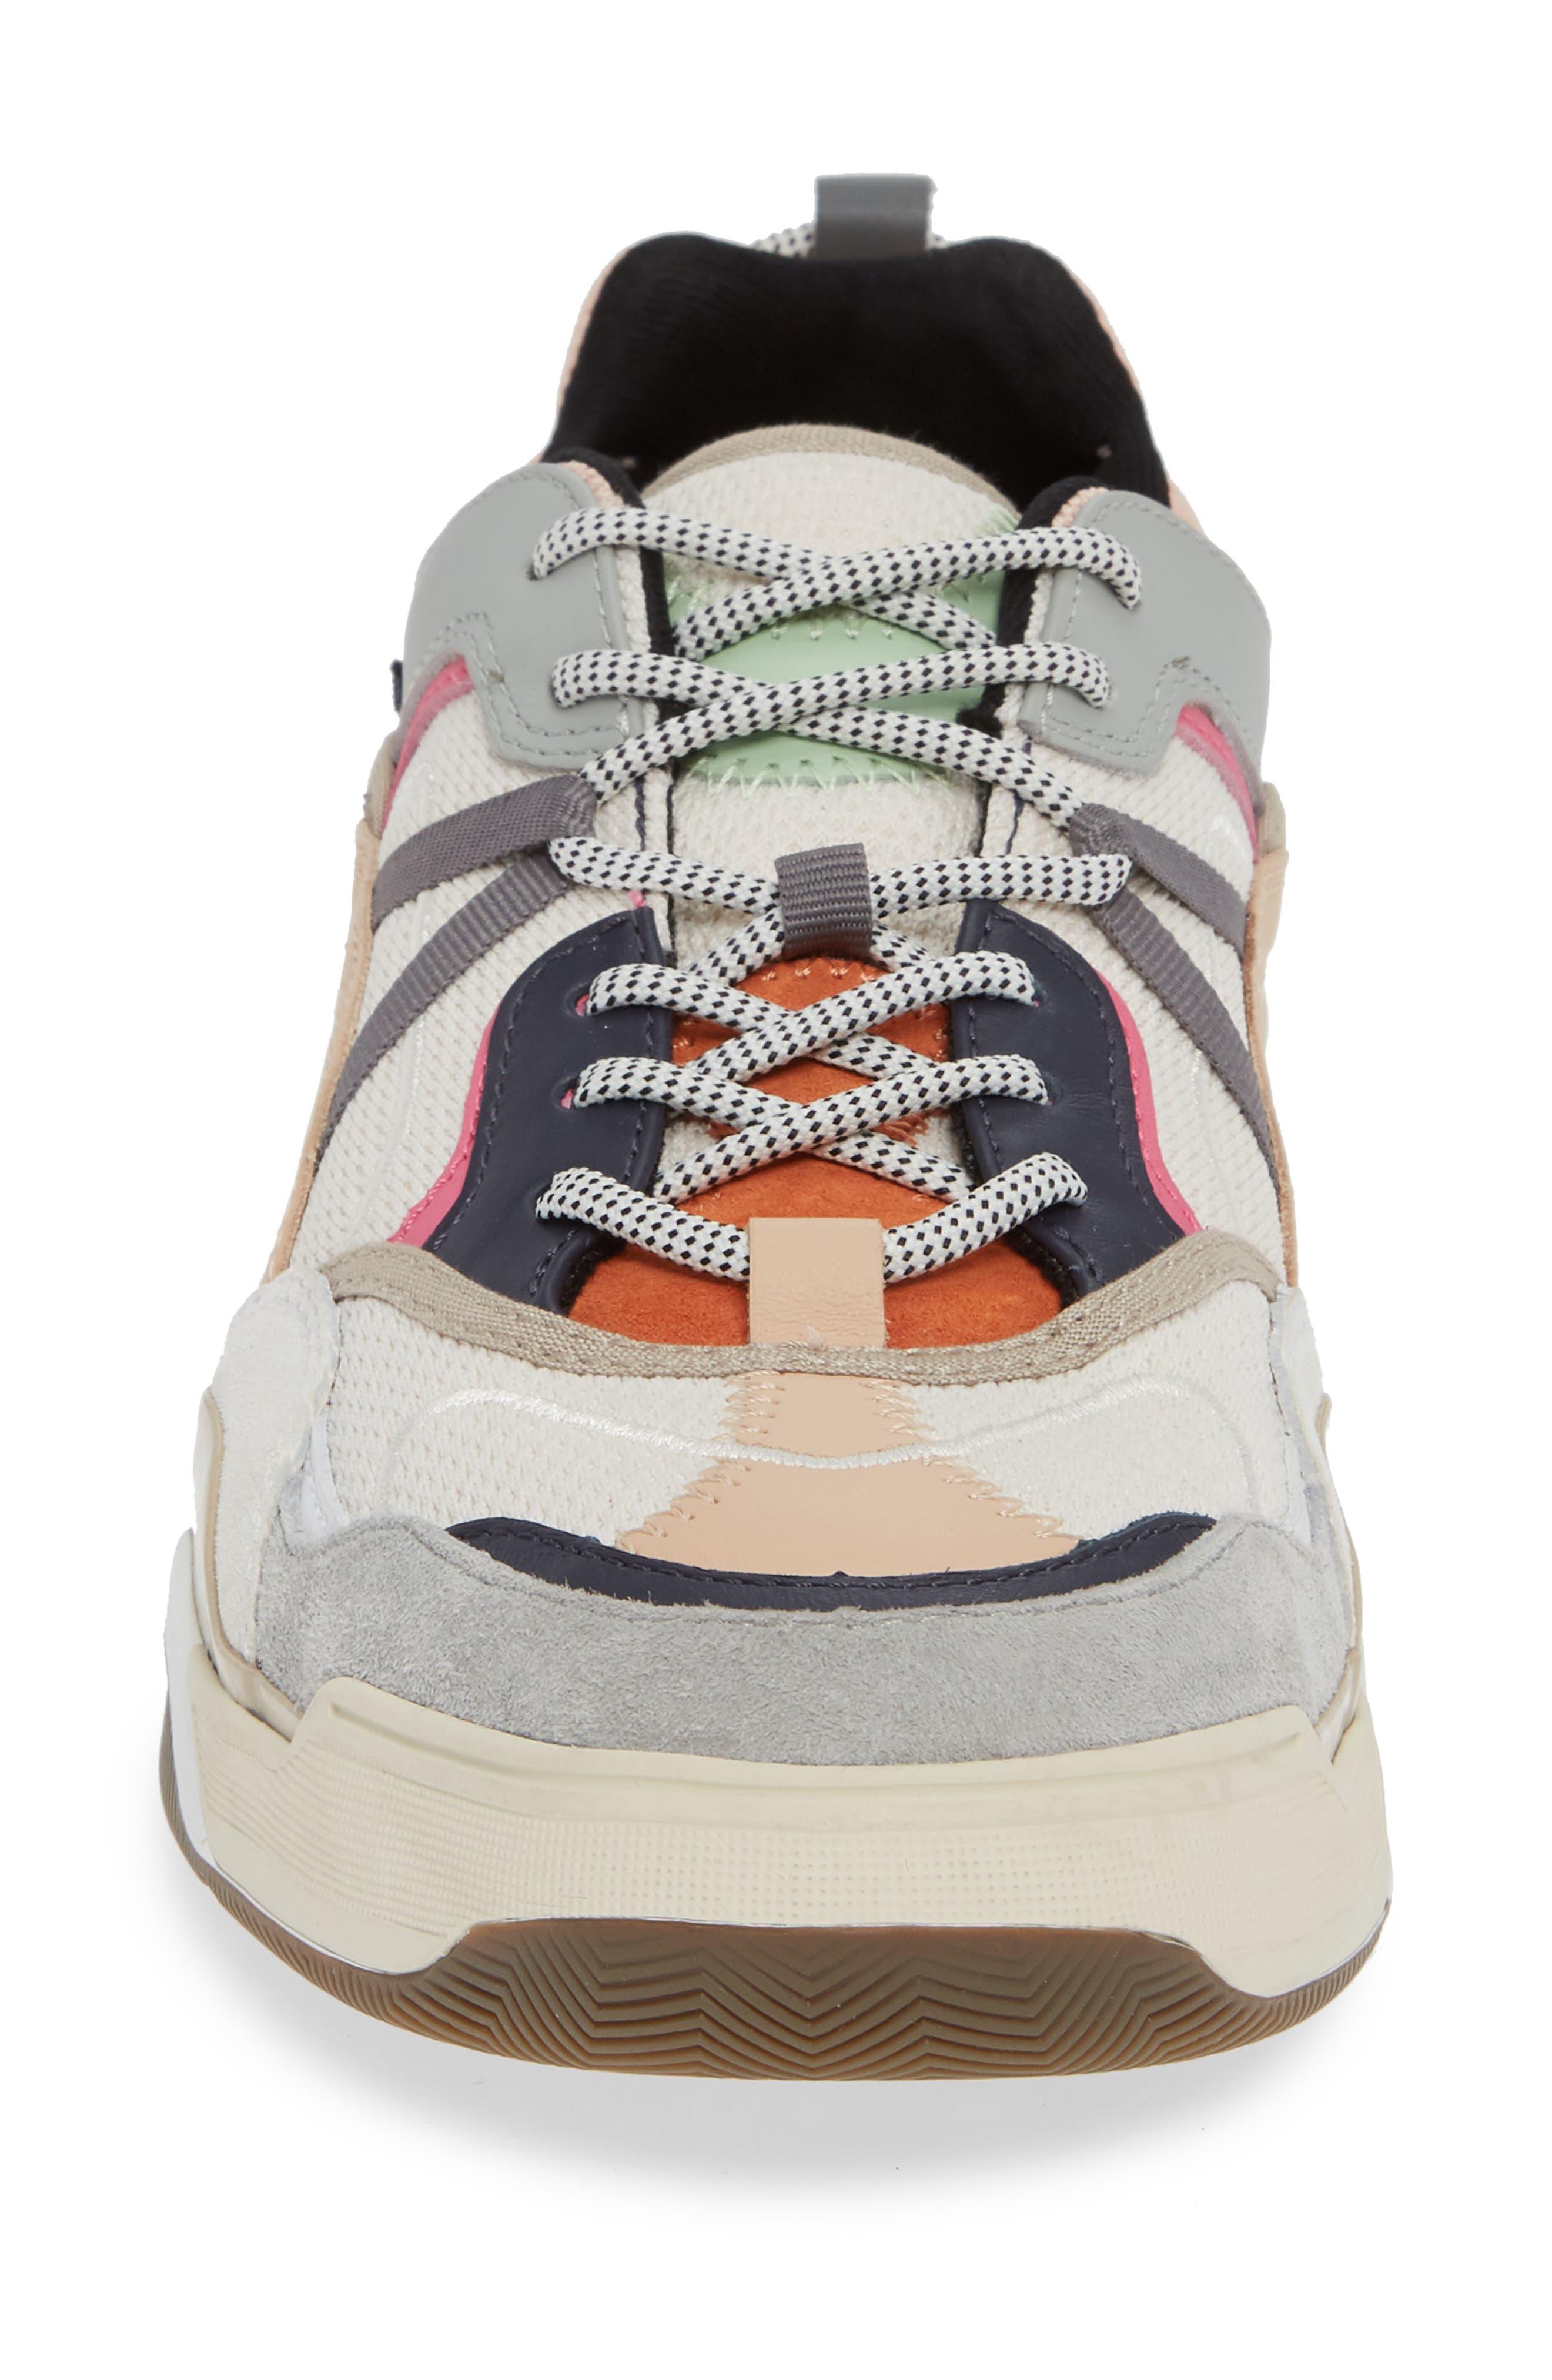 VANS,                             Varix WC Sneaker,                             Alternate thumbnail 4, color,                             TURTLEDOVE/ TRUE WHITE LEATHER